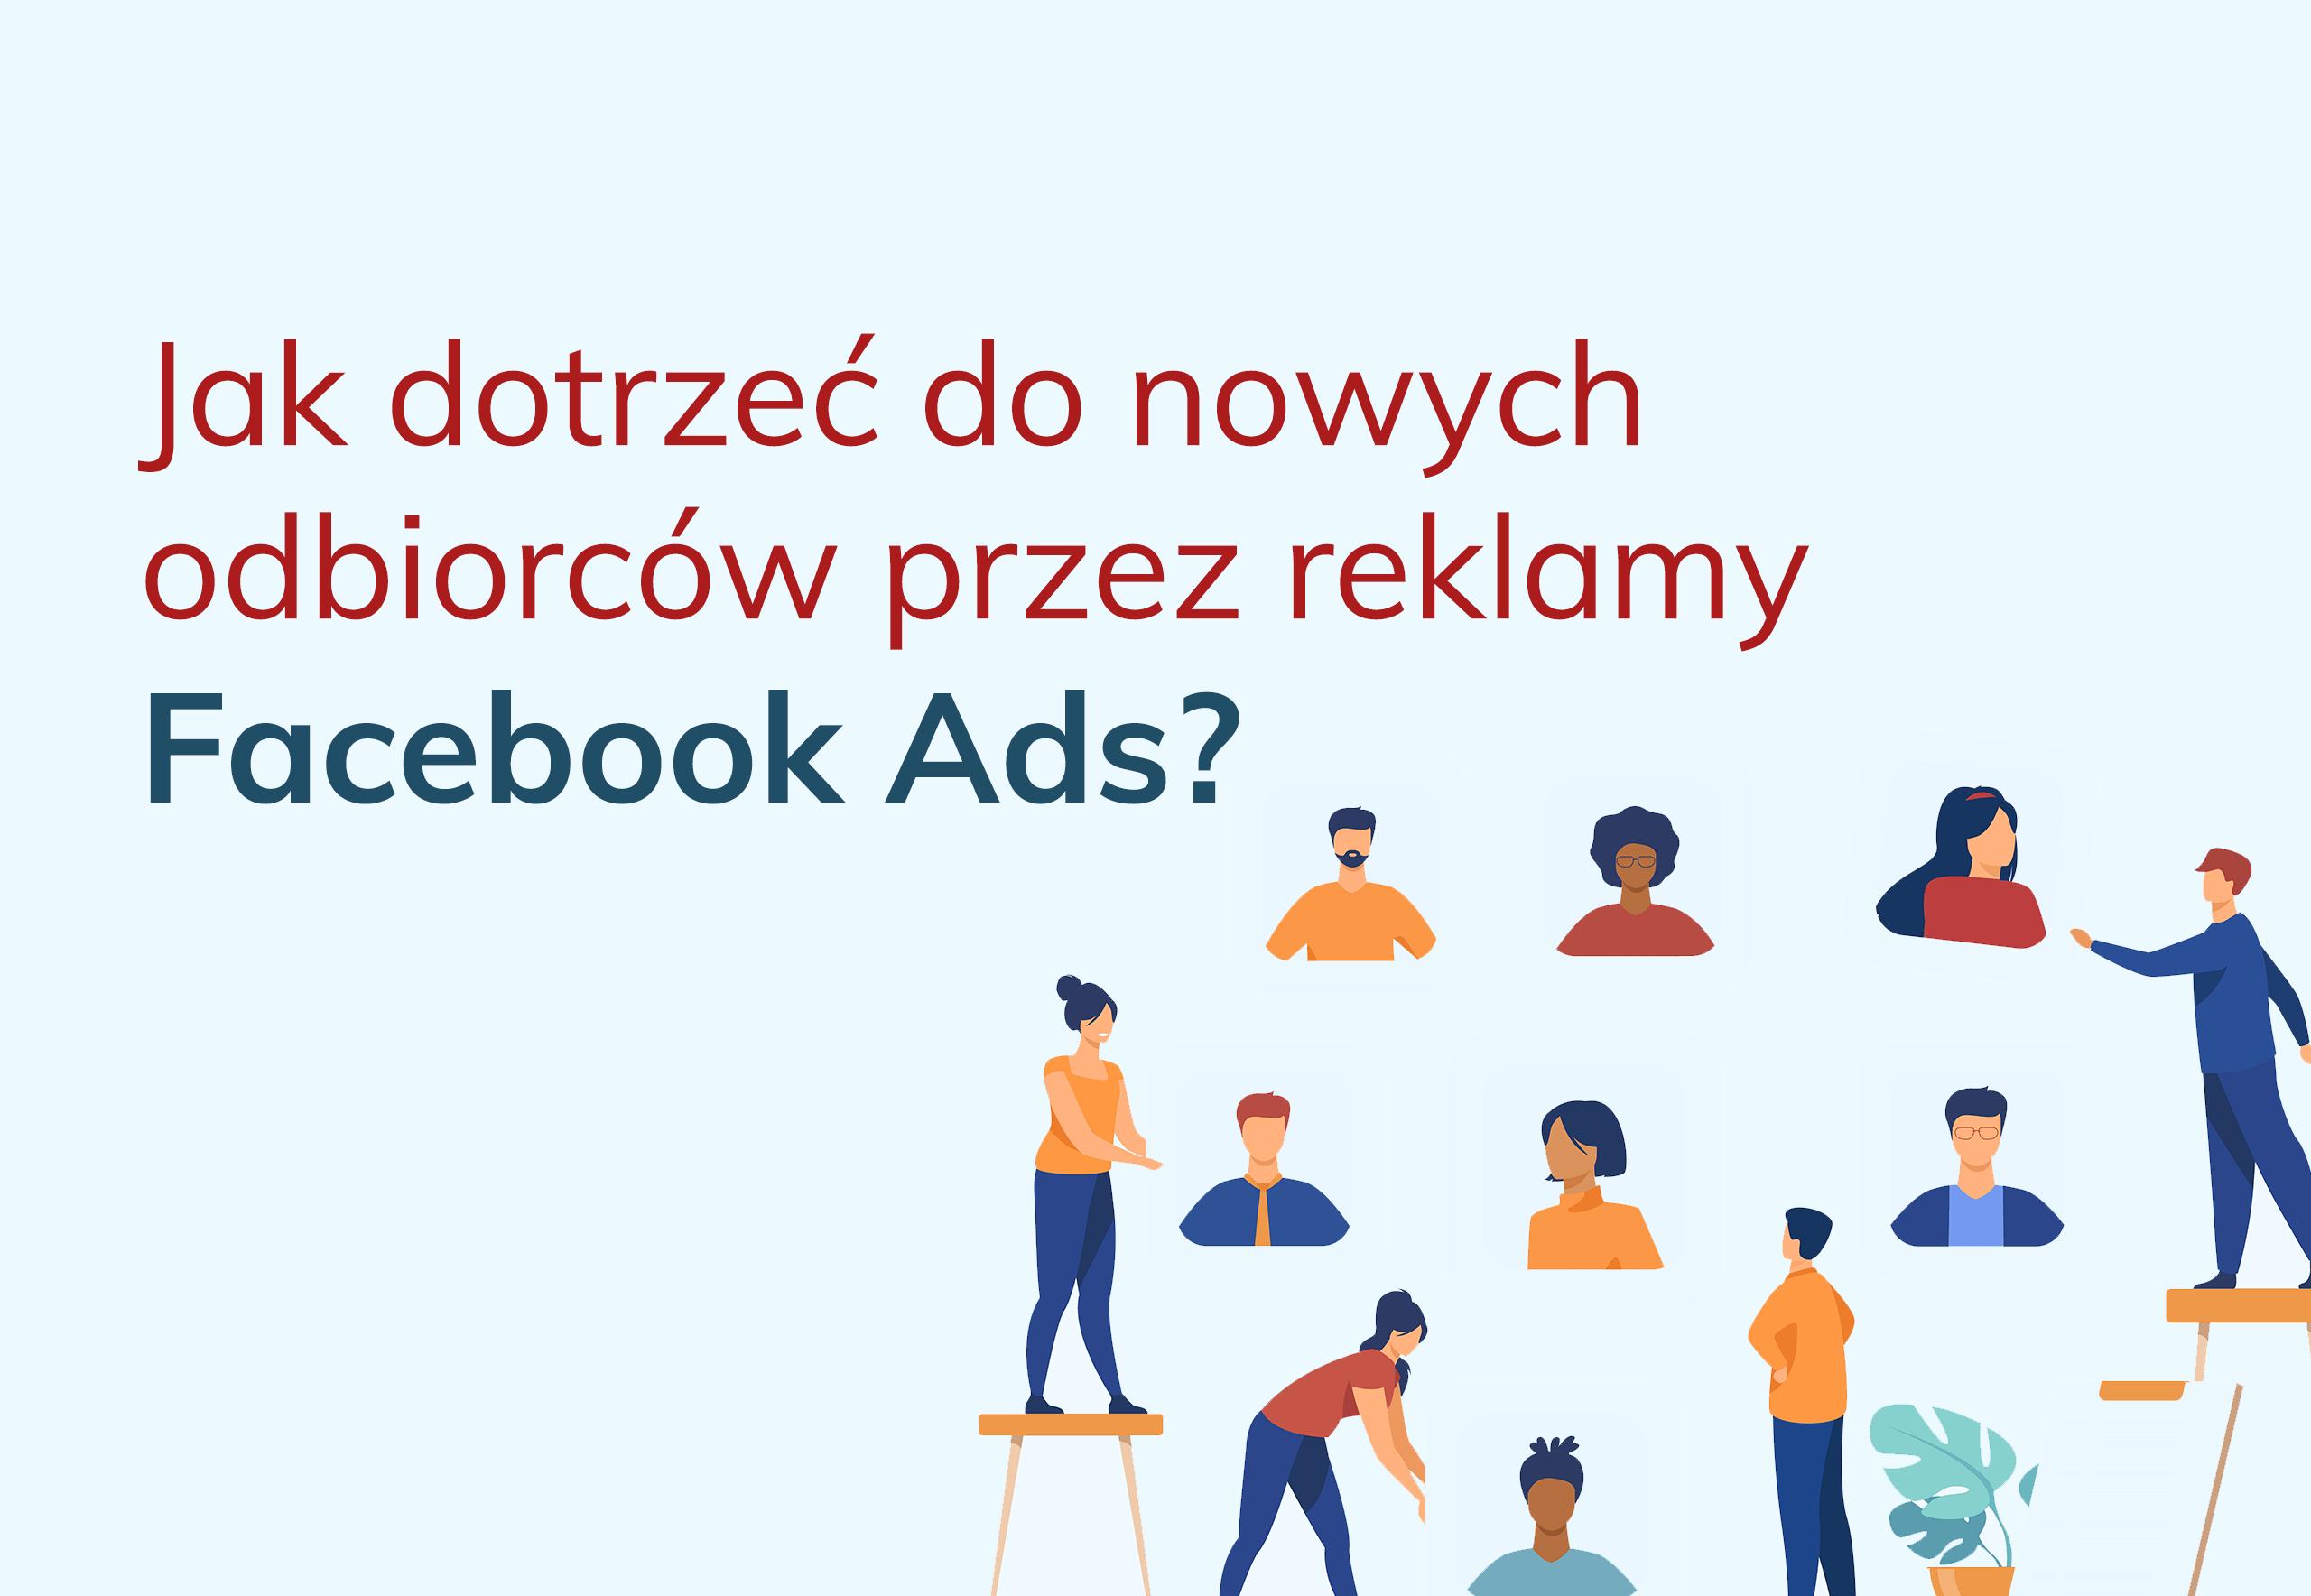 targetowanie facebook ads